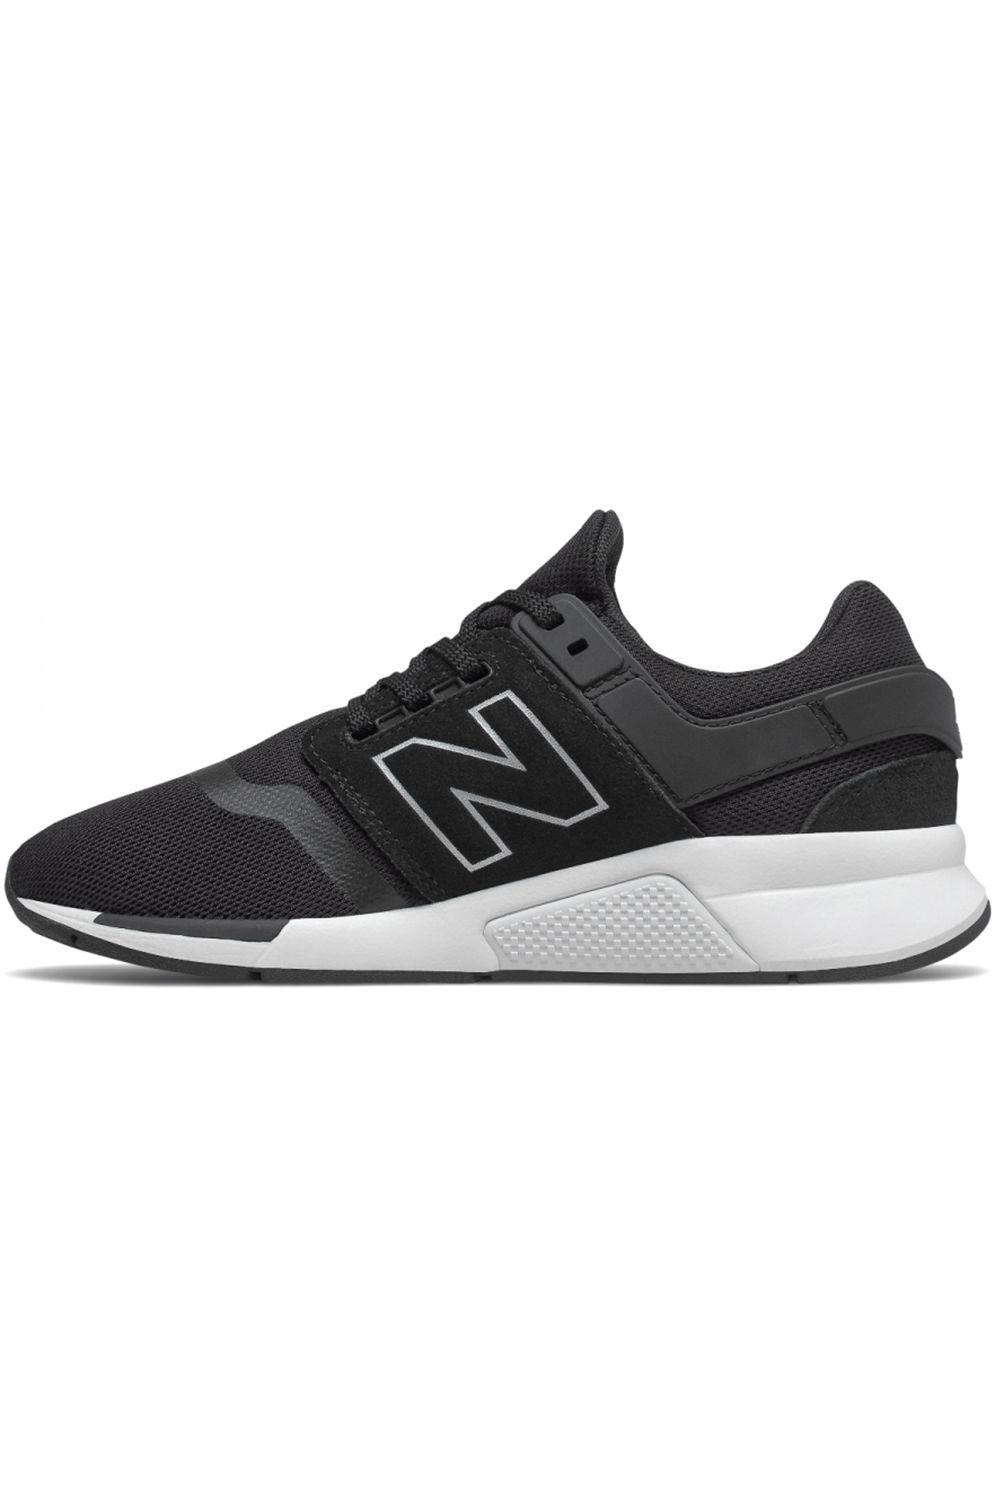 Tenis New Balance GS247 Black